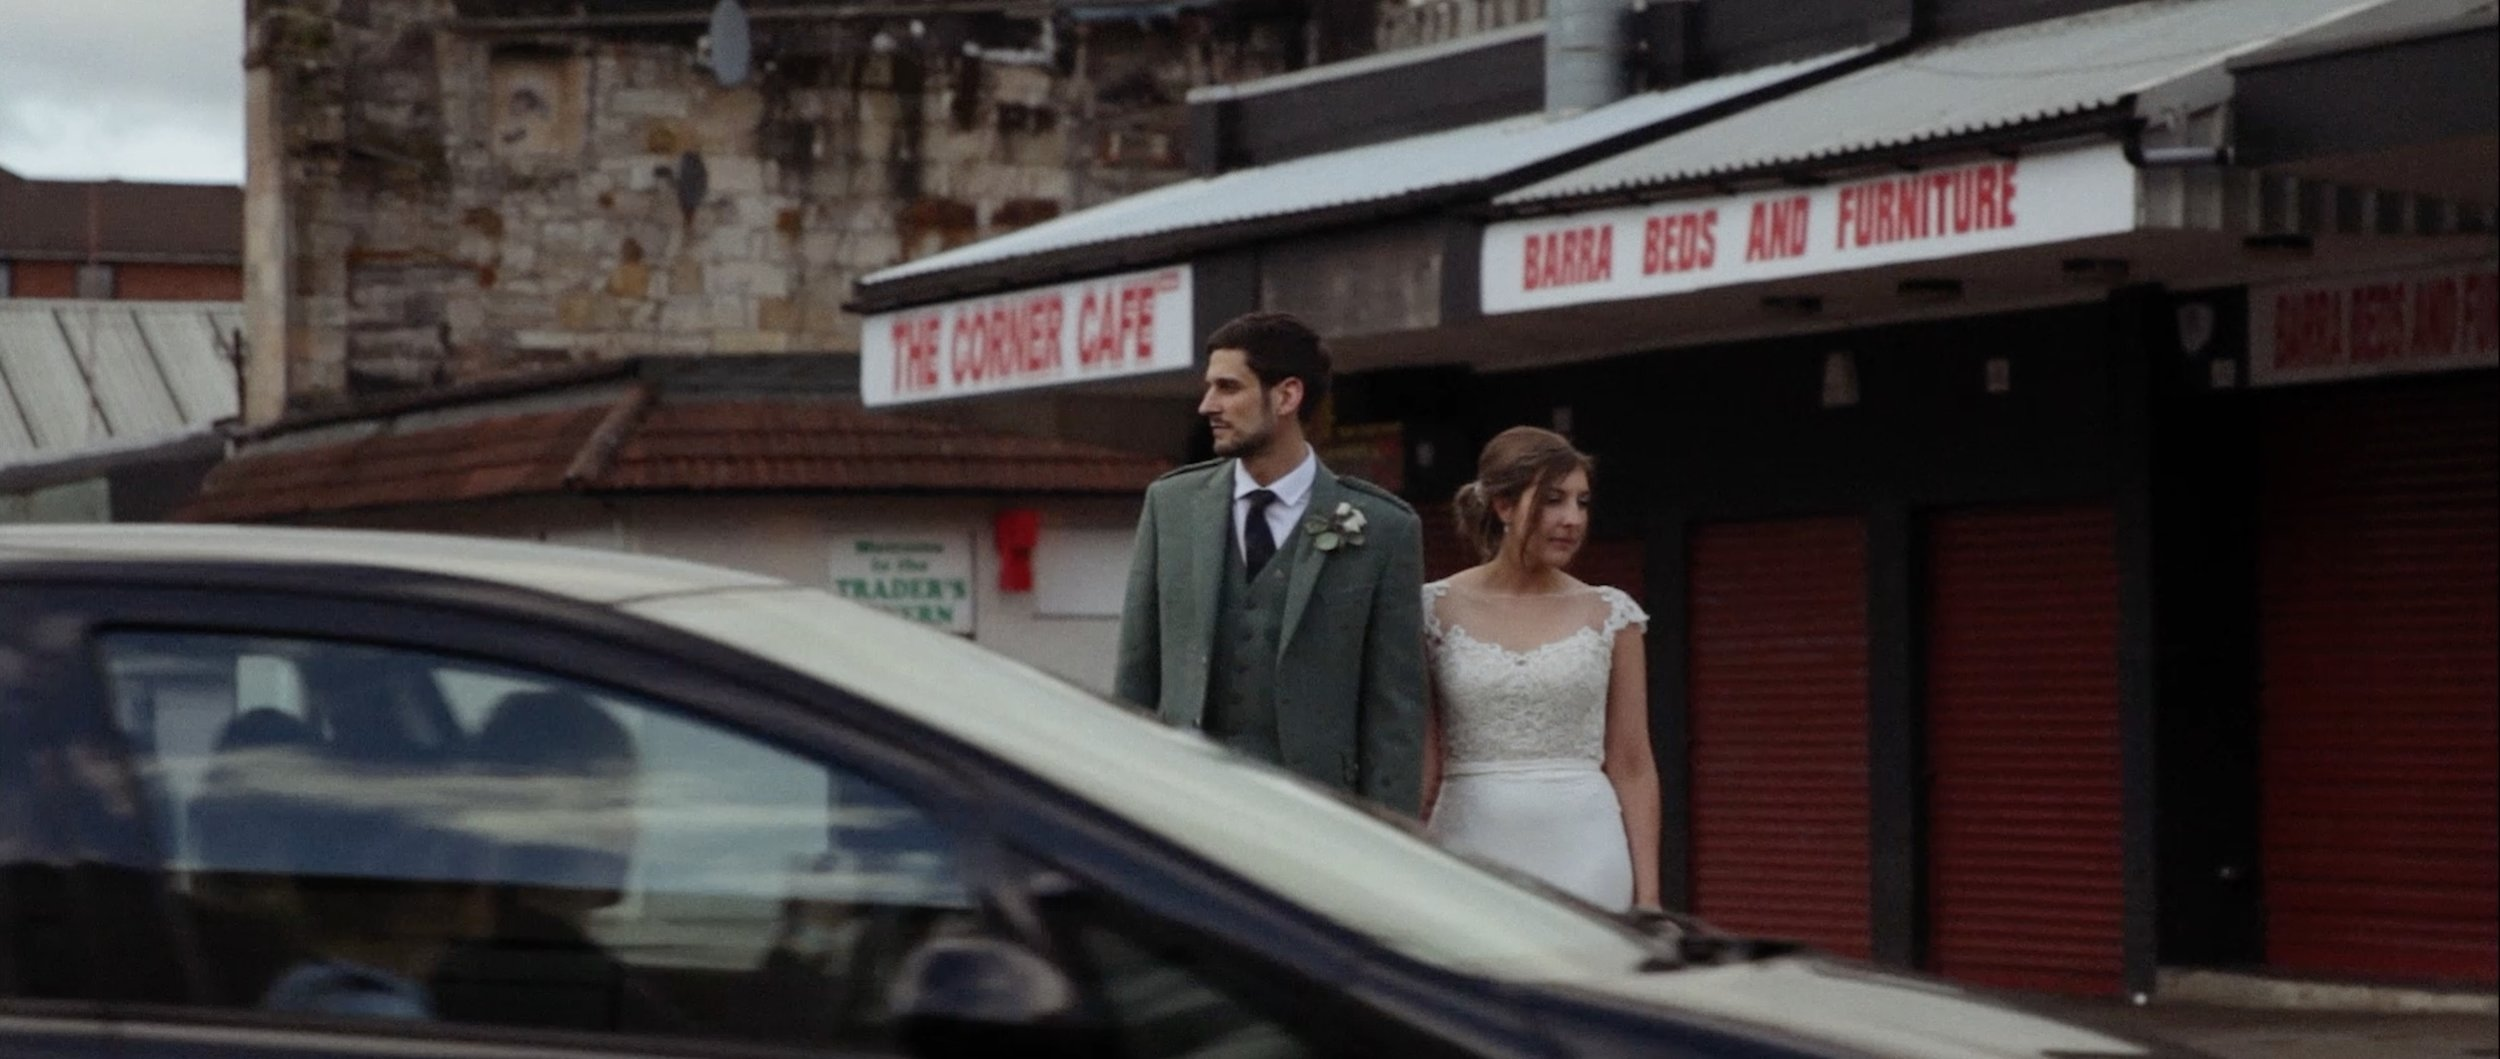 banchory-wedding-videographer_LL_05.jpg